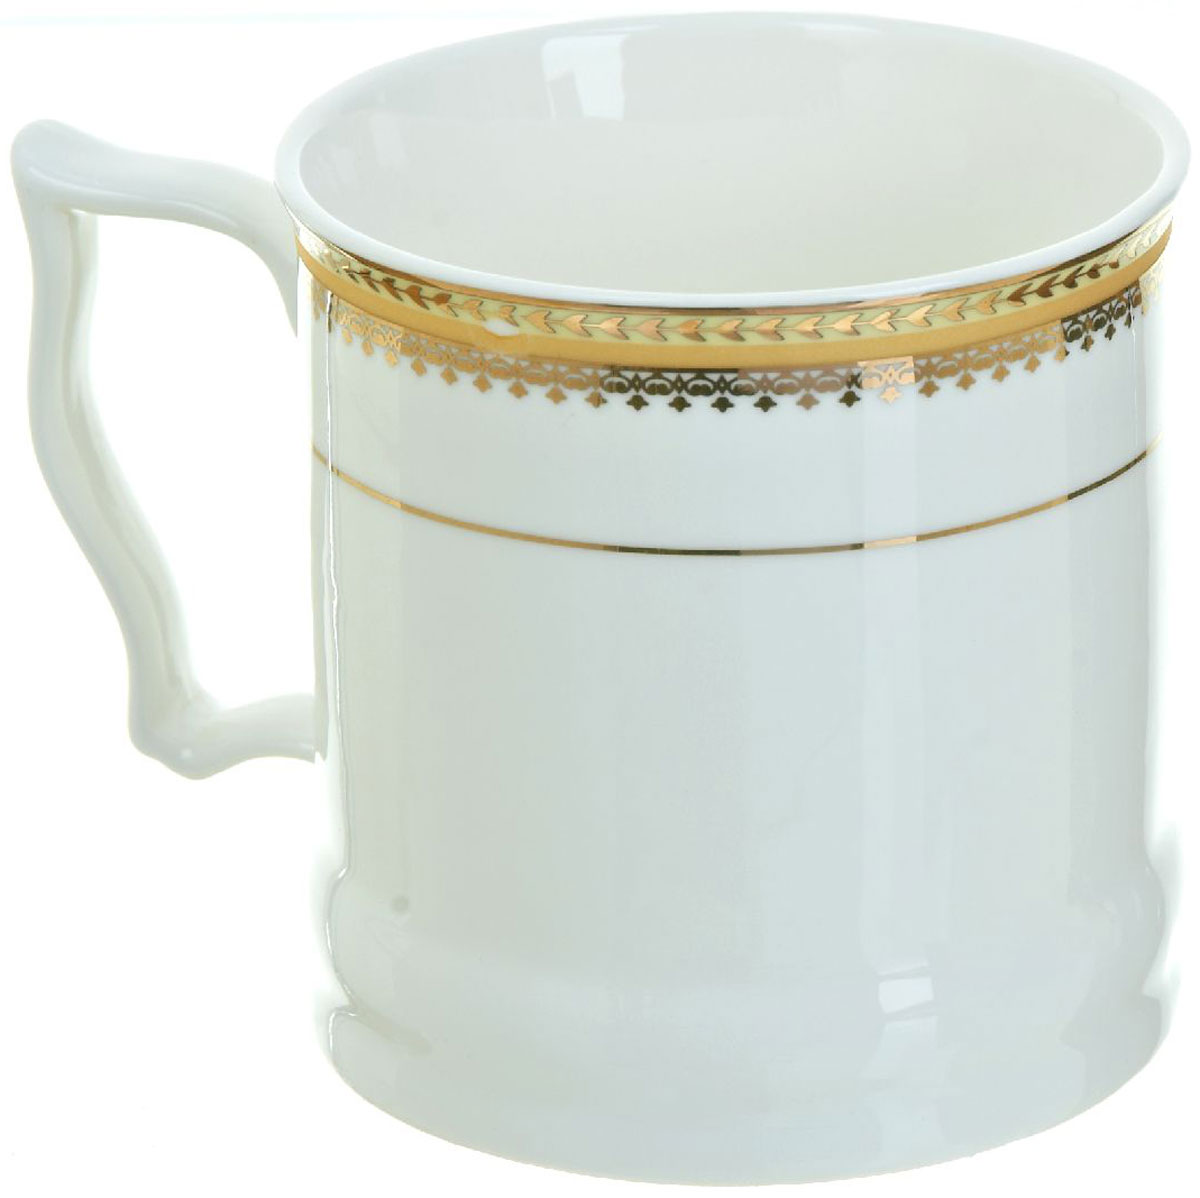 Кружка BHP Королевская кружка, 500 мл. 1870009 кружка amber porcelain сердечки 220 мл